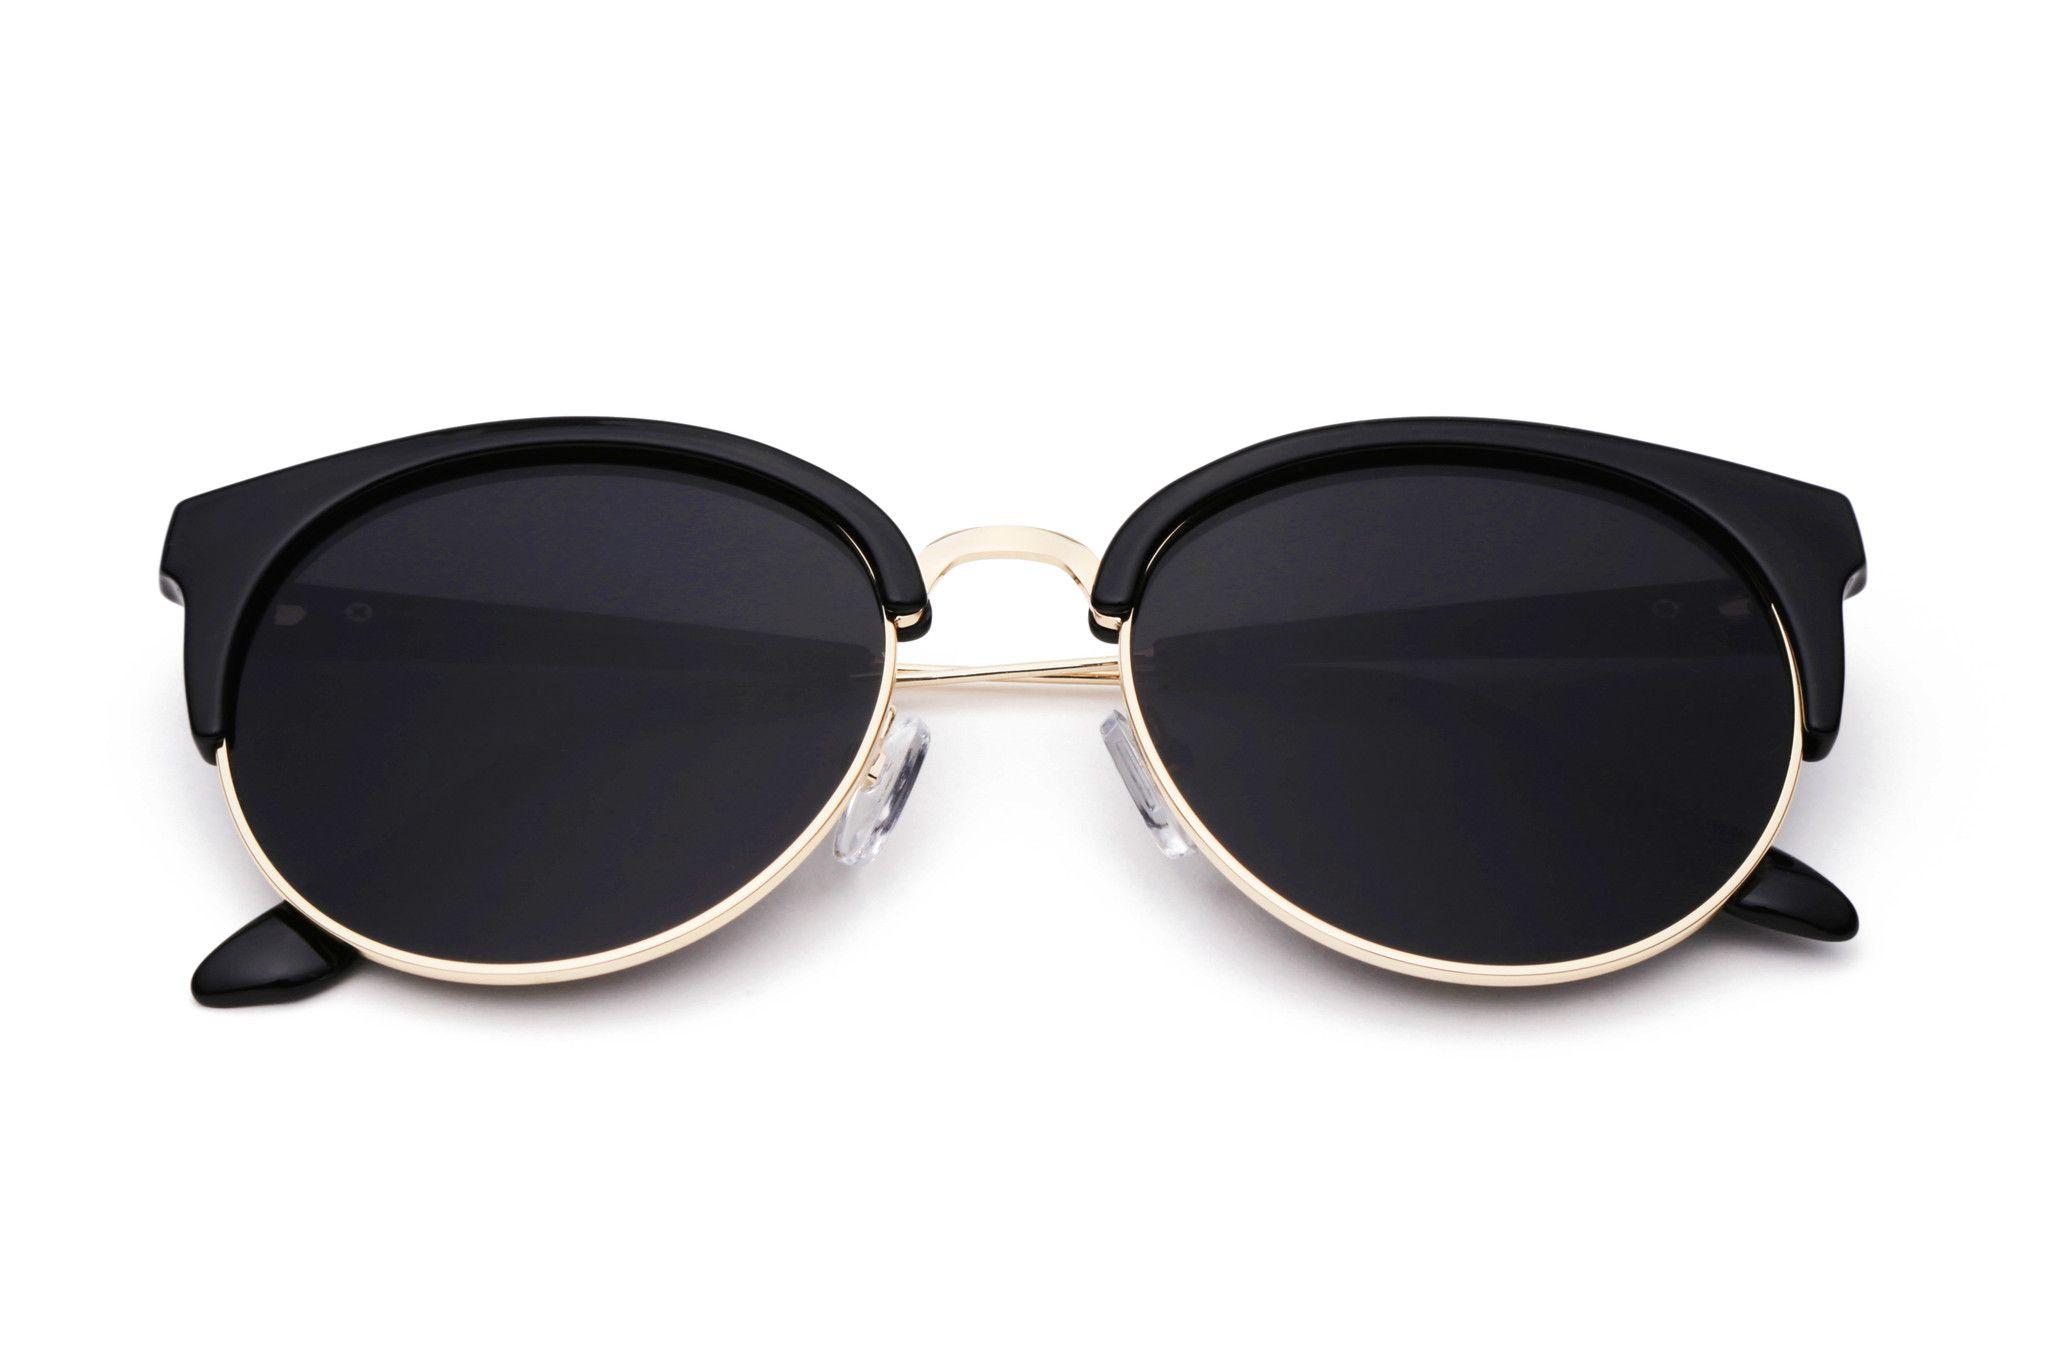 THE SPARK   Óculos de Sol grande Olho de Gato Vintage Redondo Fashion a971b2e4c5